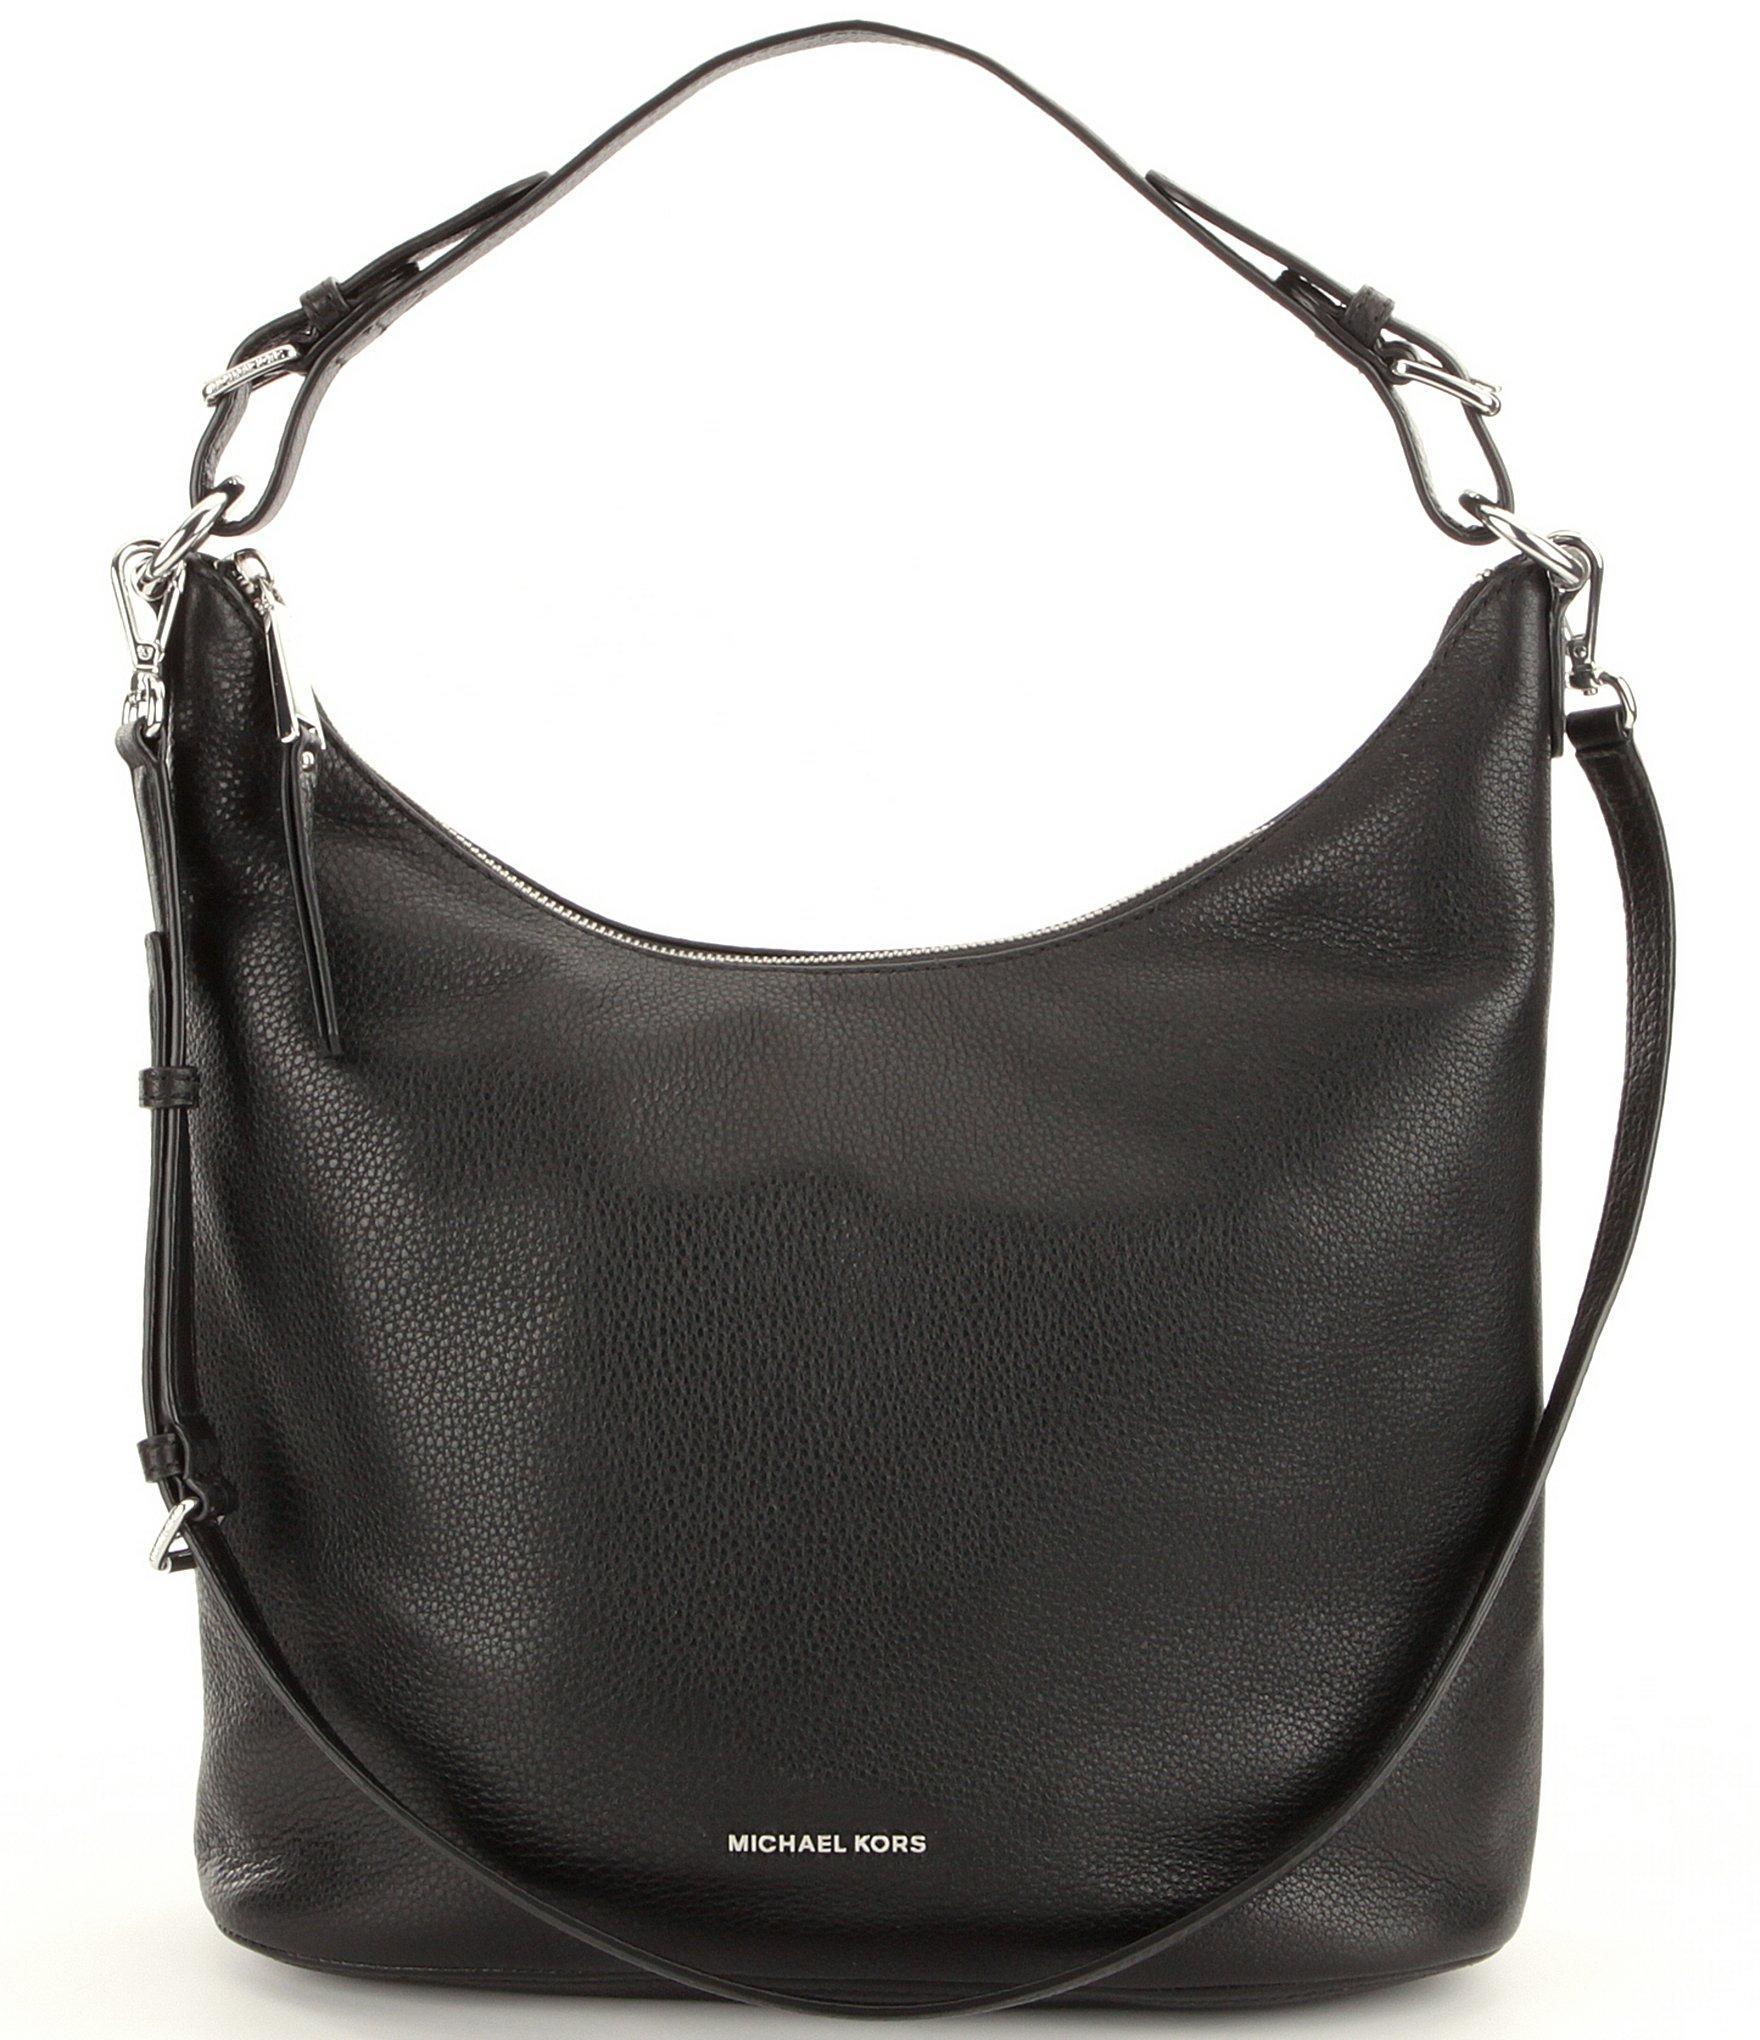 Lyst - MICHAEL Michael Kors Lupita Large Hobo Bag in Black 22b79f4f89